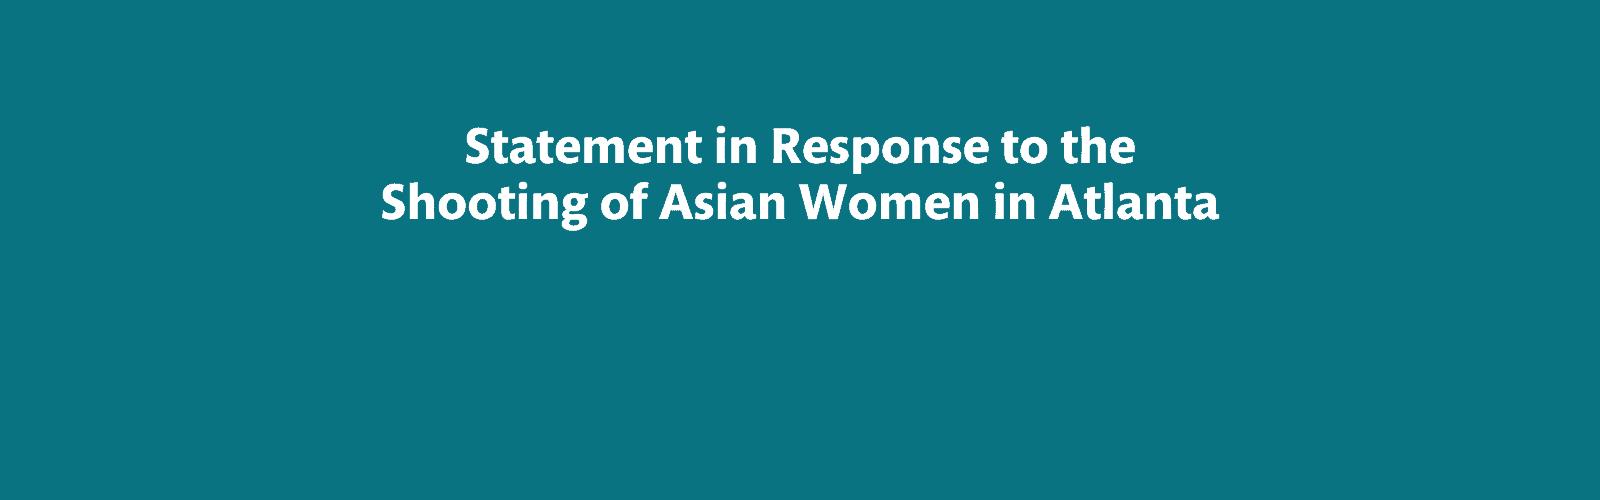 Statement in Response to Shooting of Asian Women in Atlanta